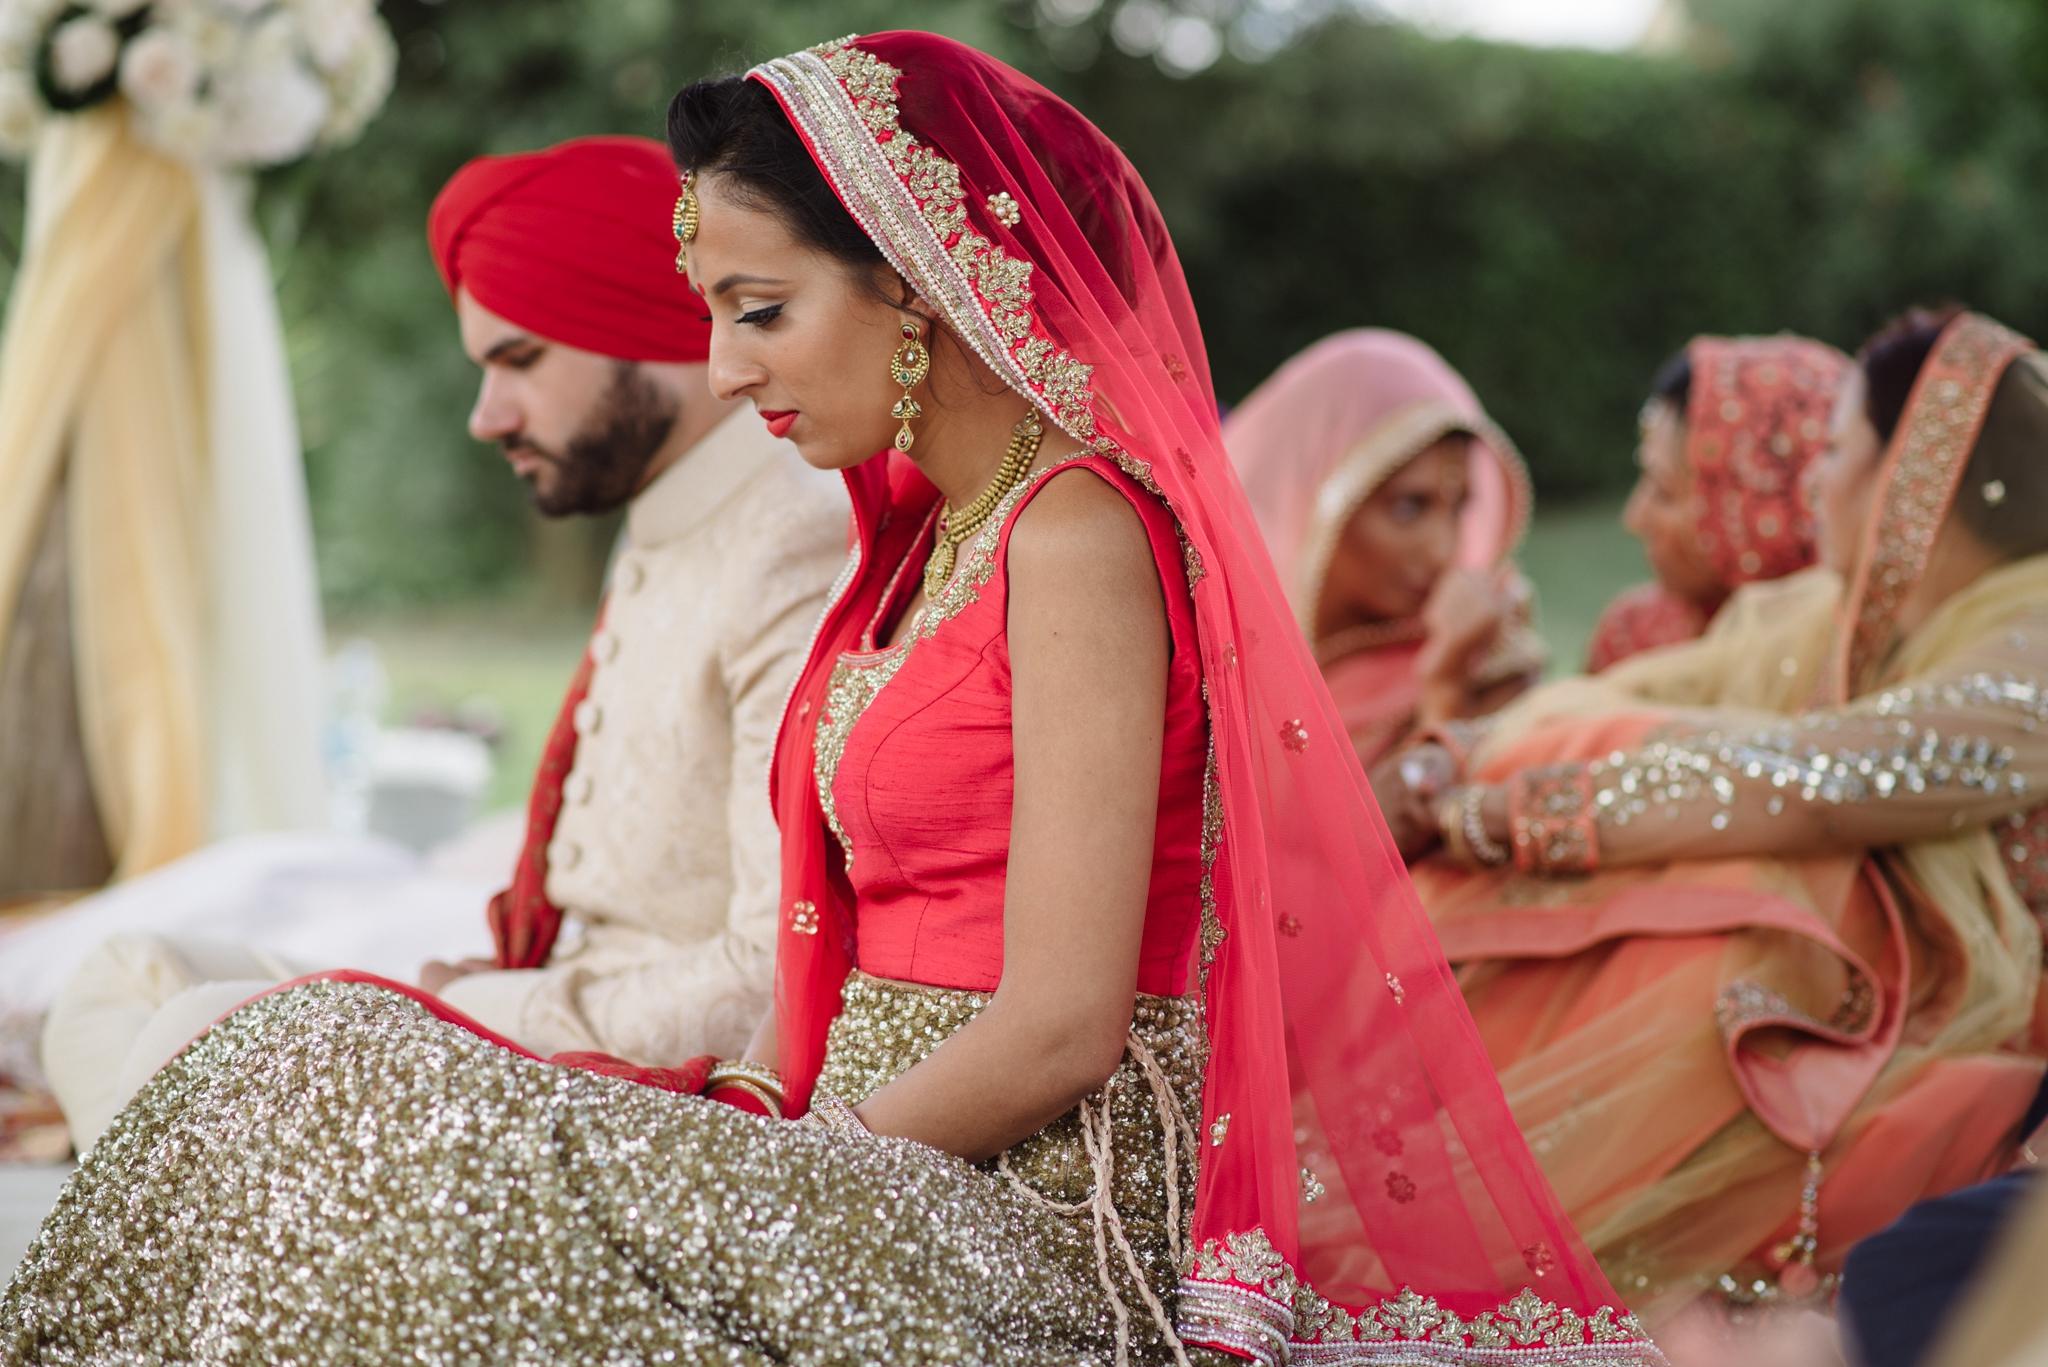 elisabetta-marzetti-indian-wedding-italy_0044.jpg